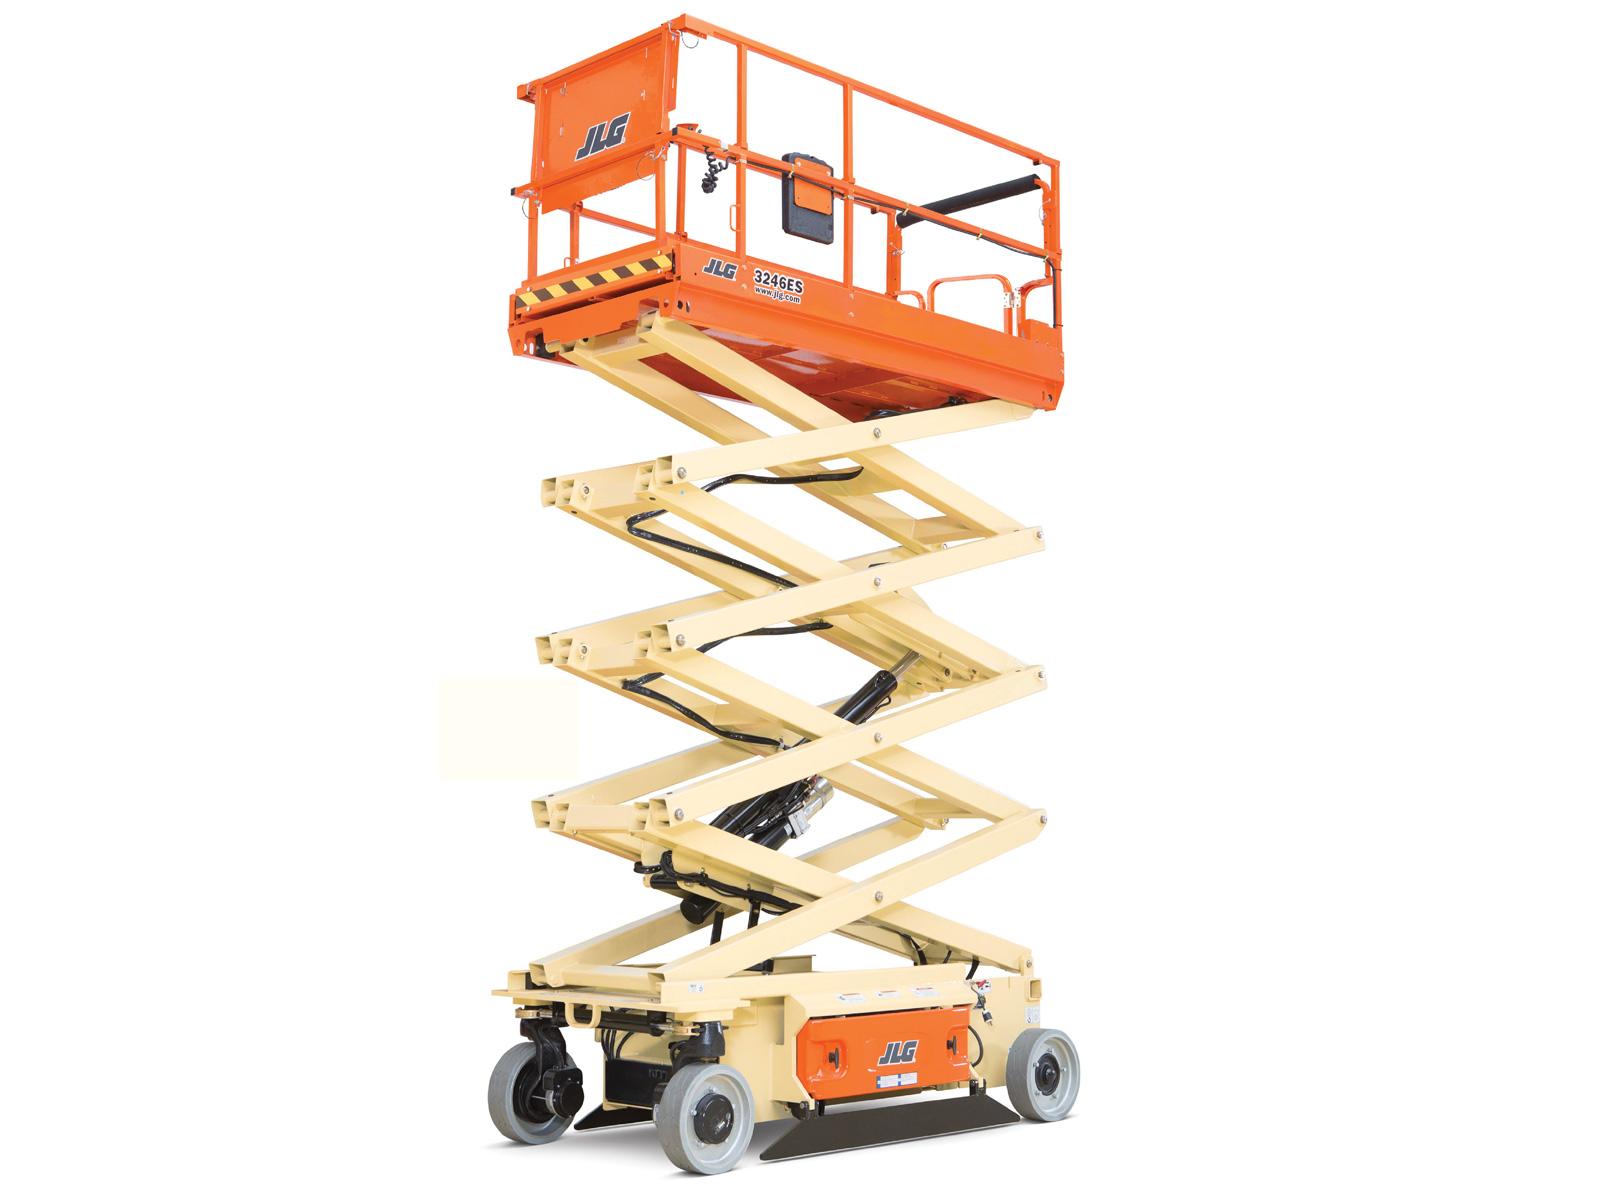 3246es electric scissor lift jlg rh jlg com 260MRT Scissor Lift Genie GS-2668 RT Scissor Lift